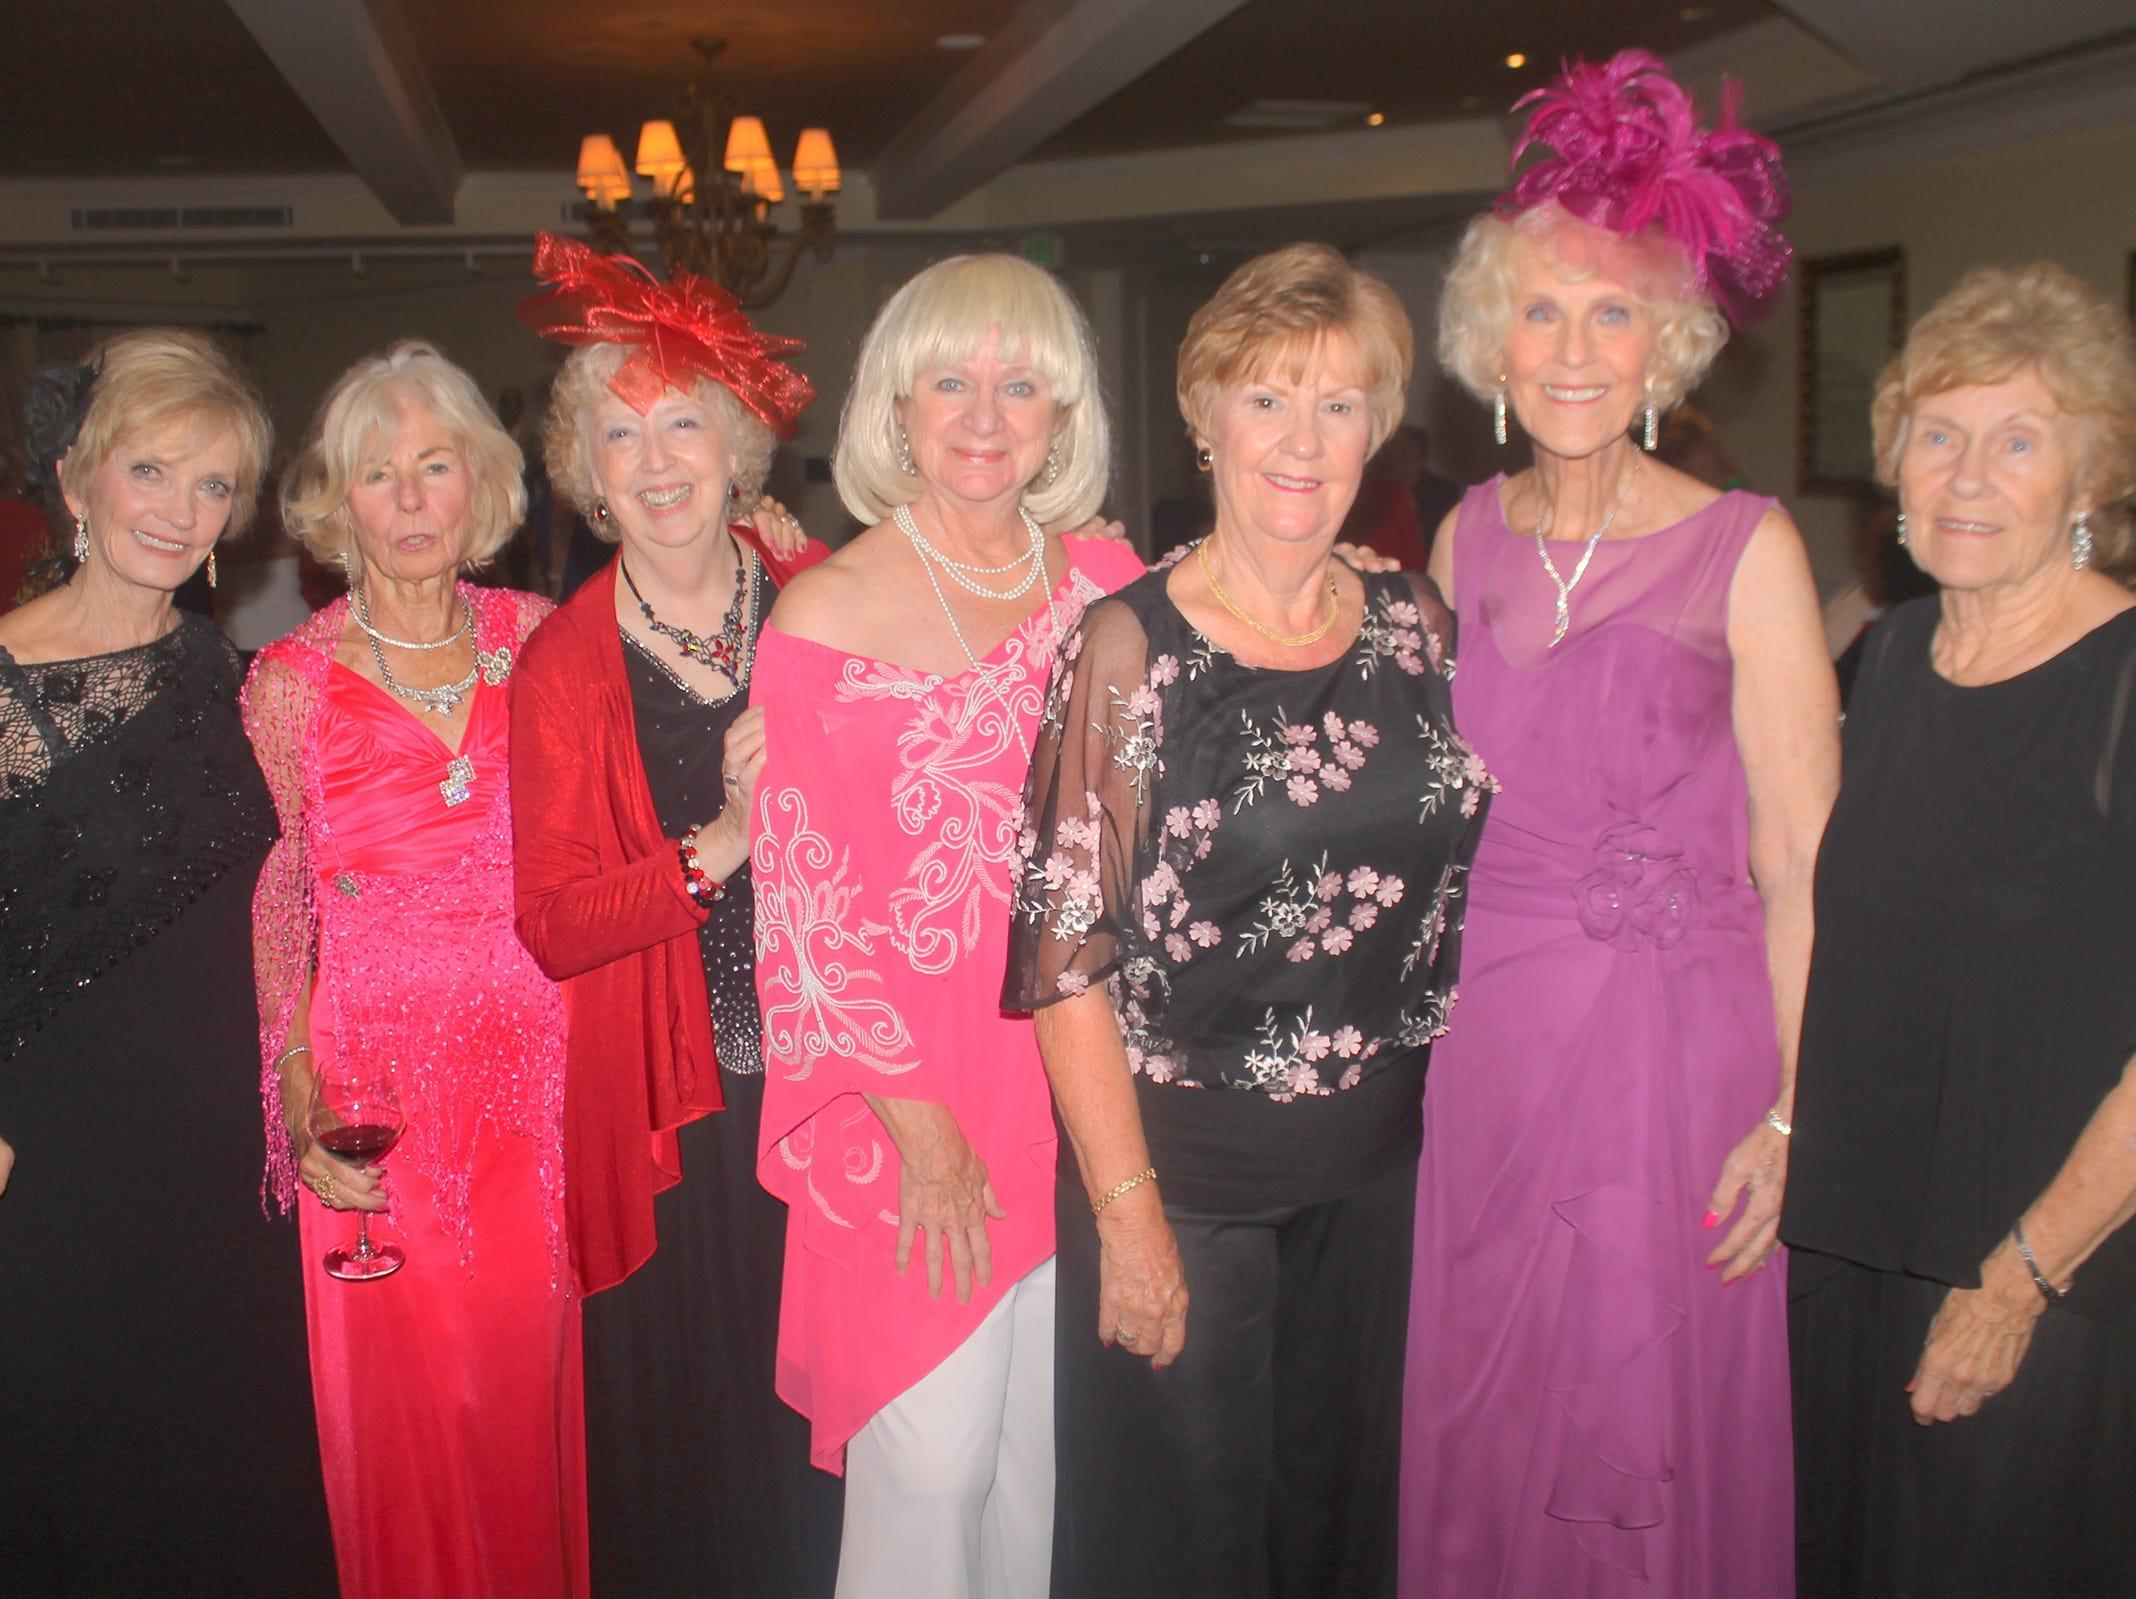 Tablemates Helen McCullough, Susanne Grossman, Cathy Mendygraw, Cindy Crane, Linda Lollander, Susie Walsh and MaryAnn Cassidy.